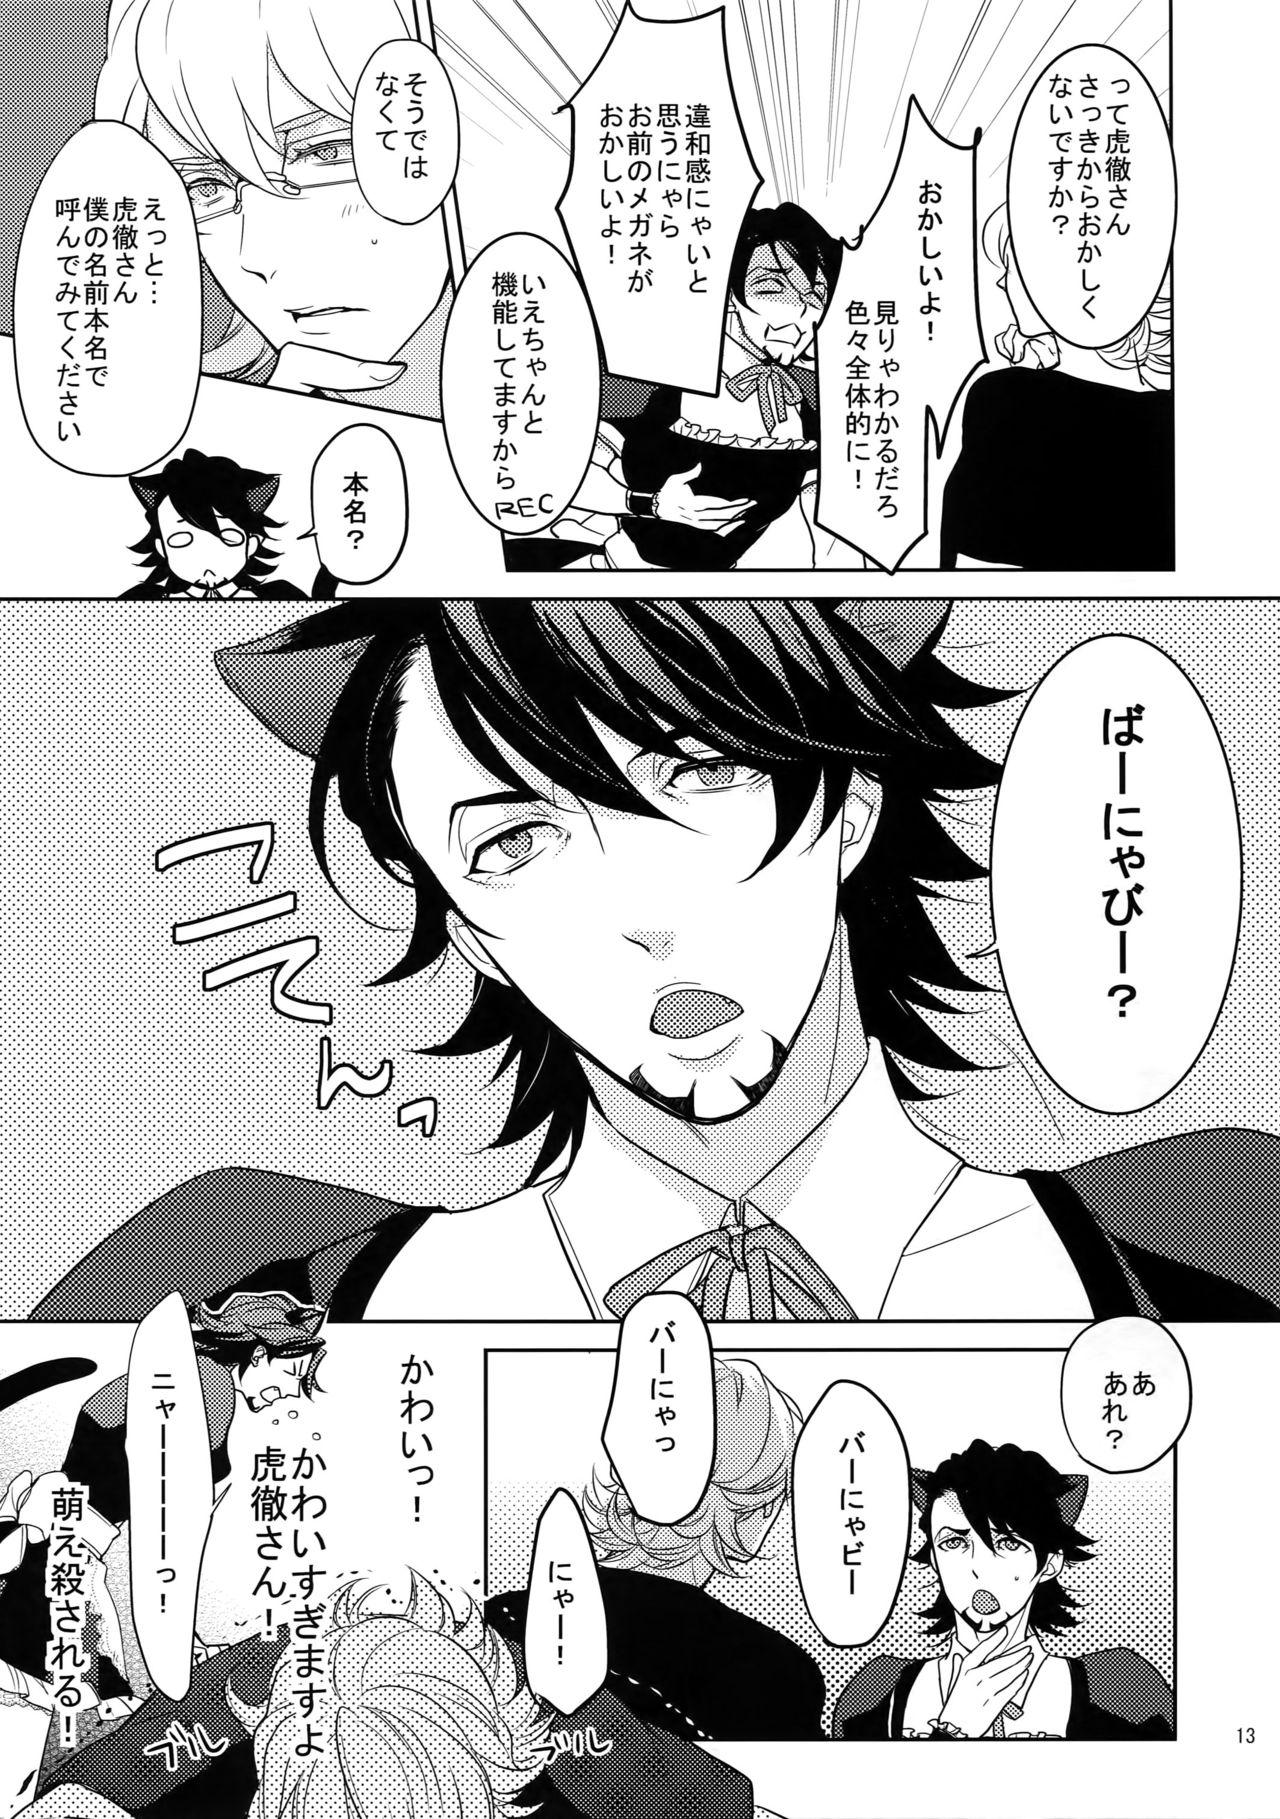 BOROZS Usagi Tora Sairoku 2 11